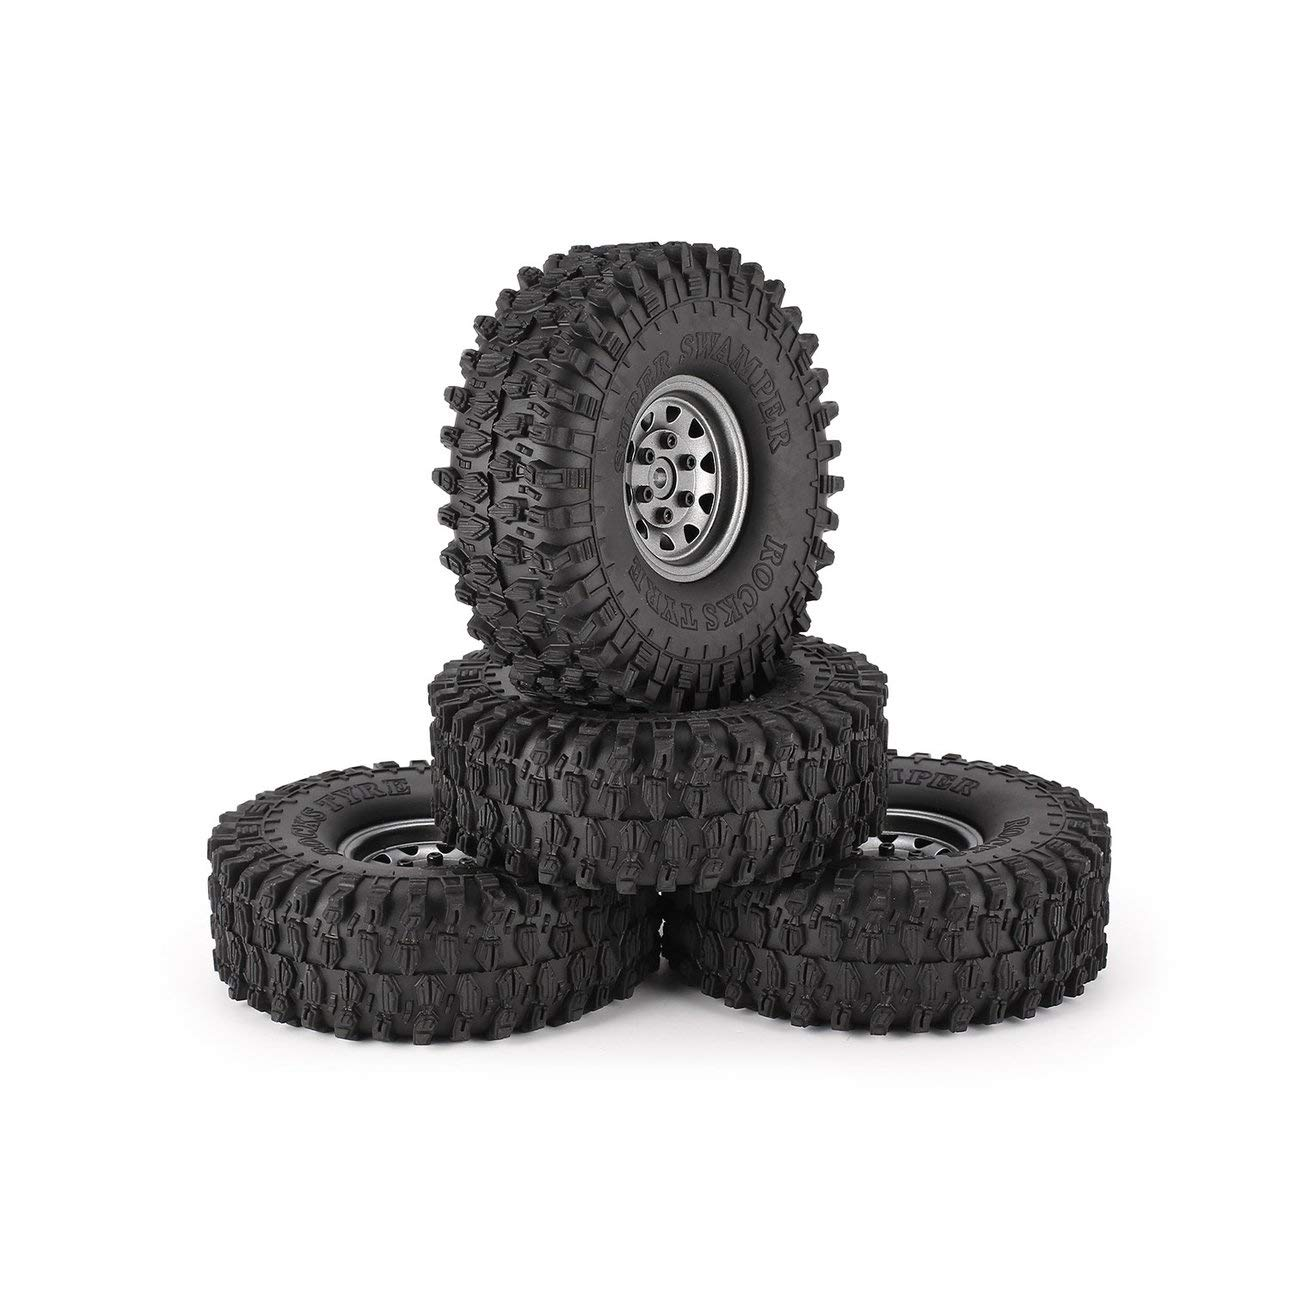 Ballylelly 4Pcs 1,9 Zoll 120mm Gummireifen Reifen mit Metall Felge Set für 1/10 Traxxas TRX-4 SCX10 RC4 D90 RC Raupen Auto Teil (Grau - Deltamuster Rad - 120mmmm)